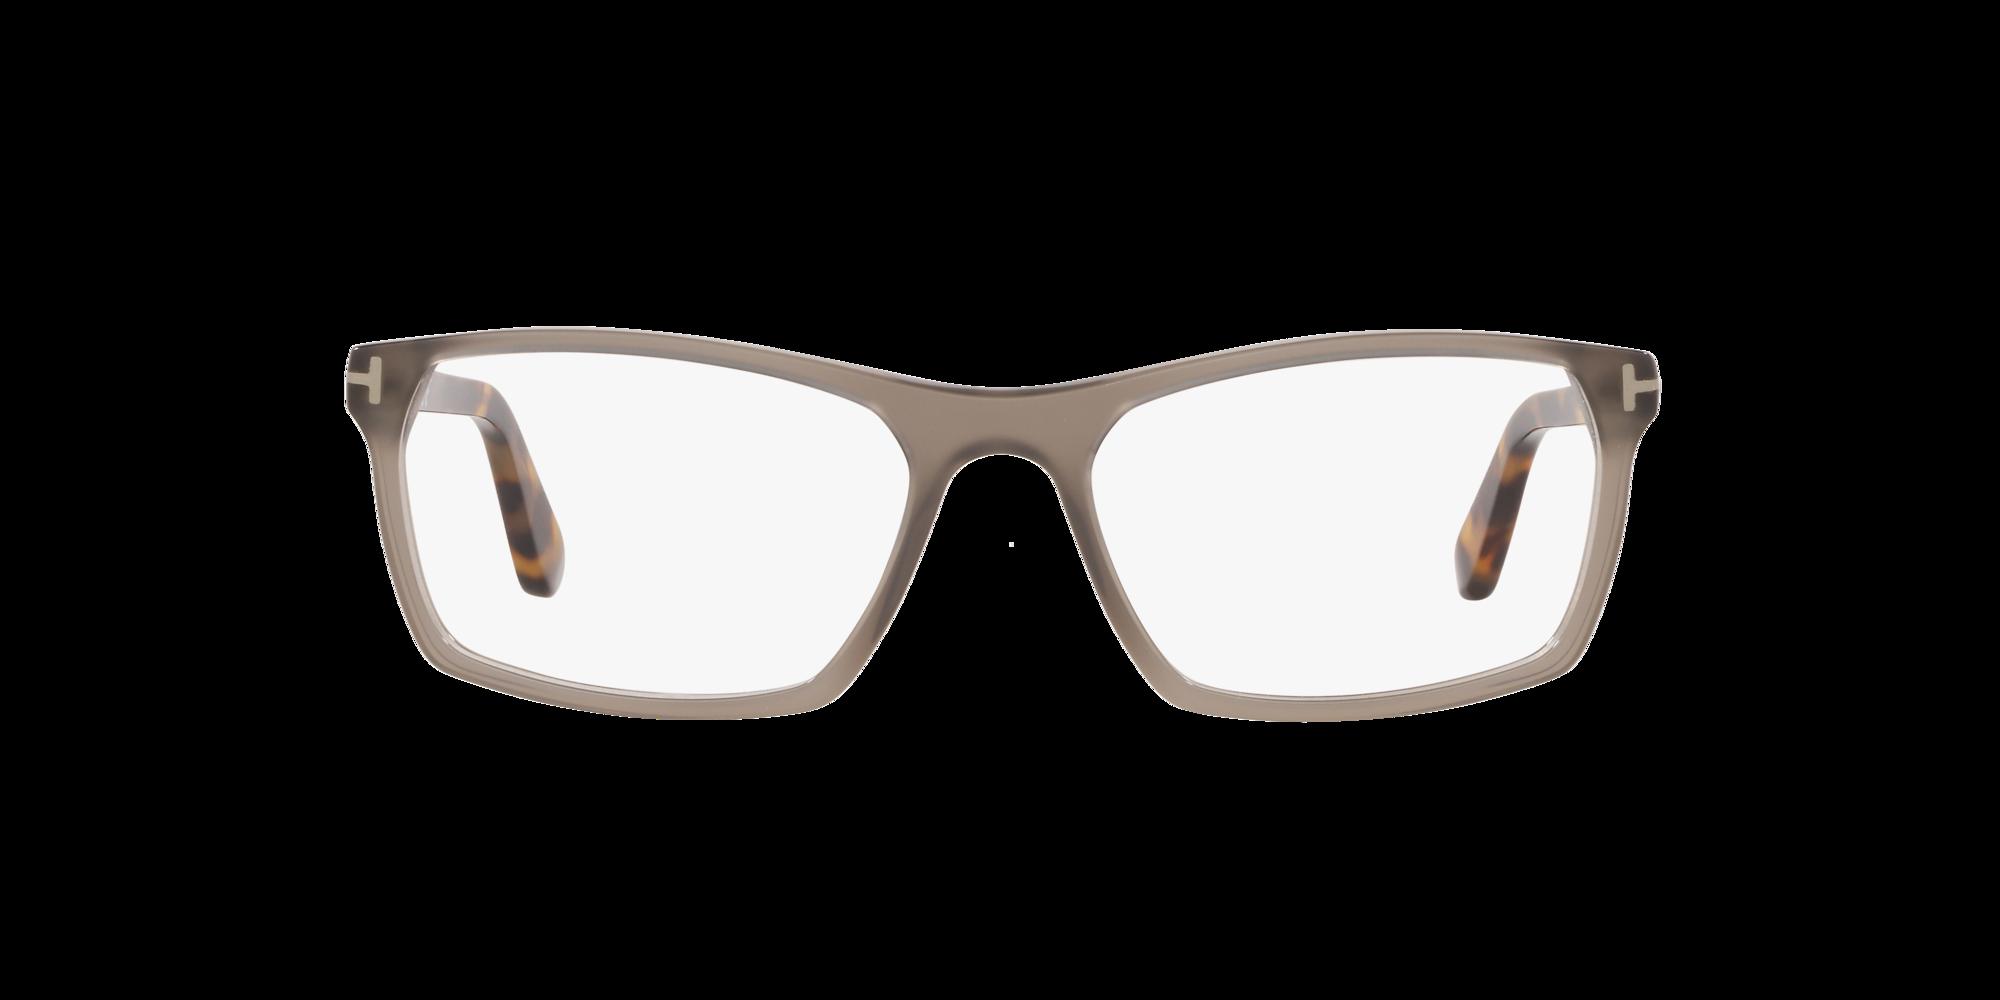 Image for FT5295 020 from LensCrafters | Glasses, Prescription Glasses Online, Eyewear